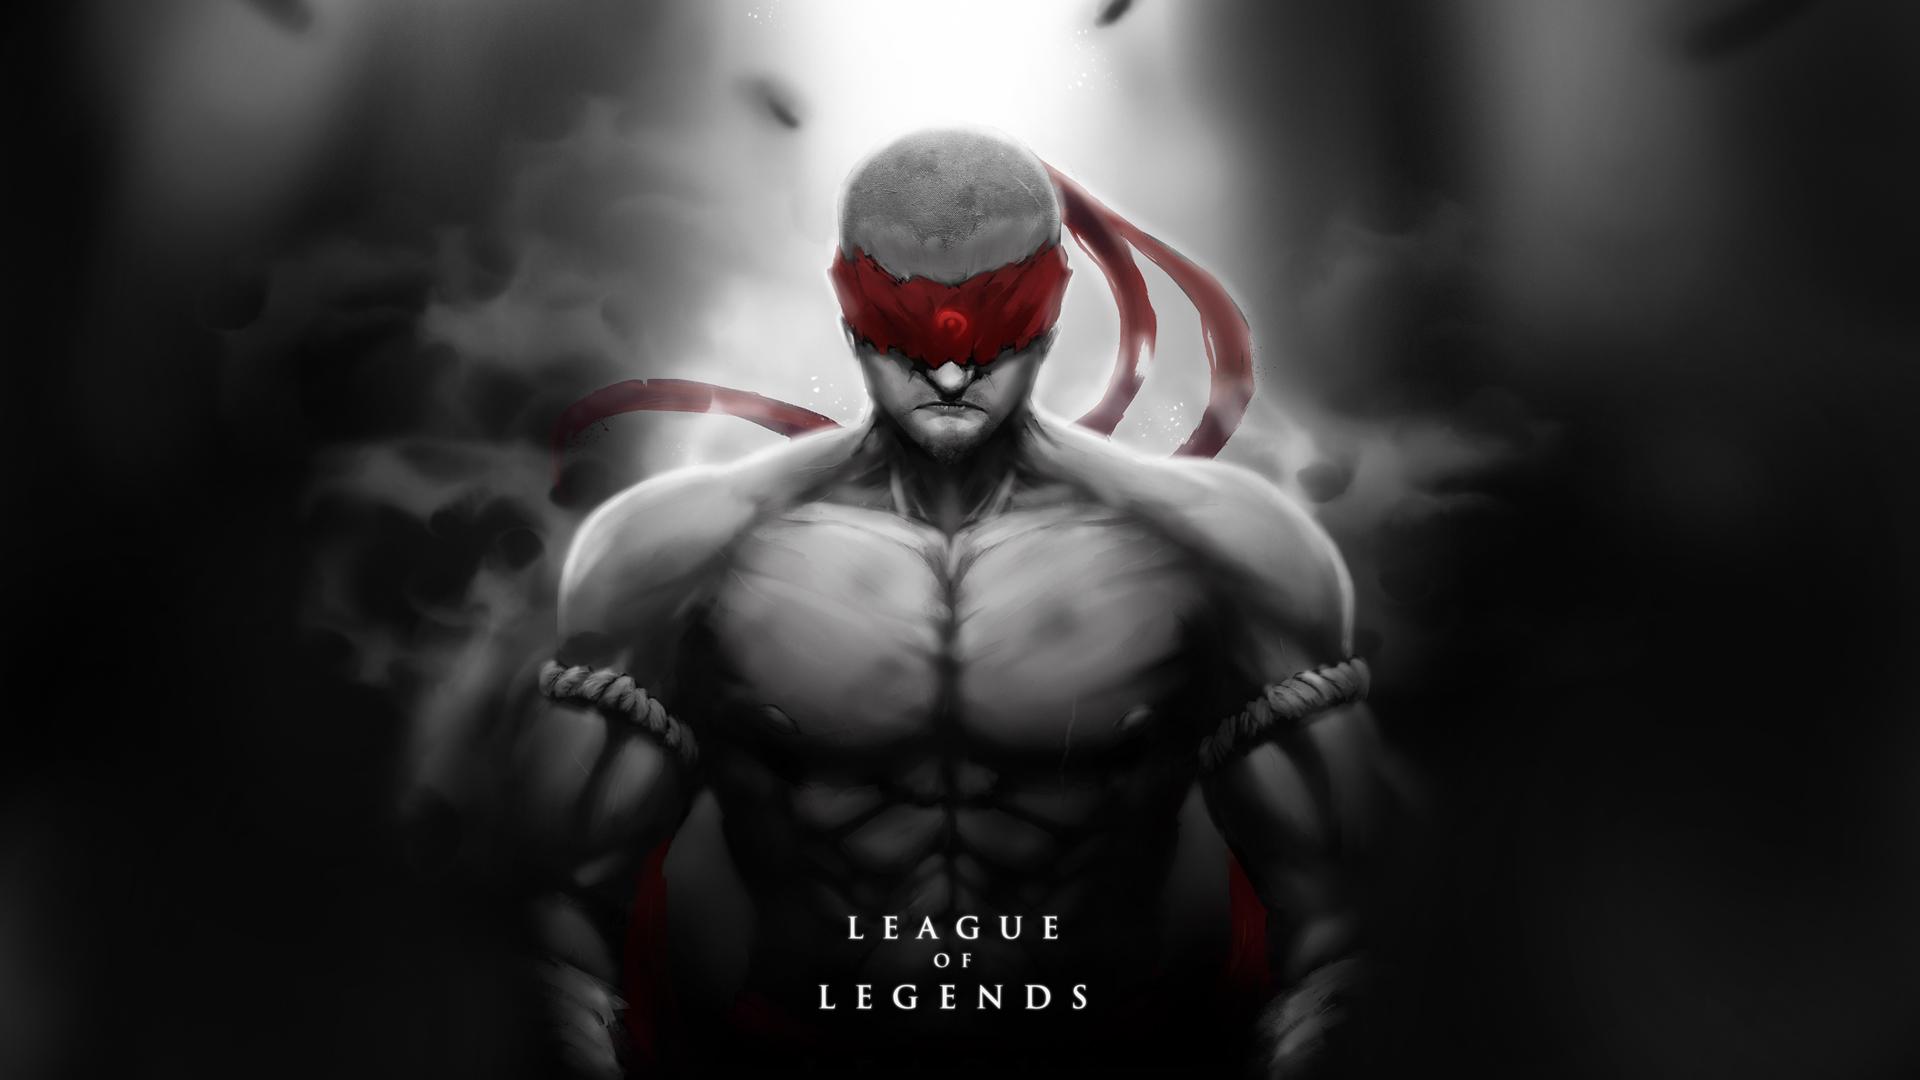 Lee Sin League Of Legends 1920x1080